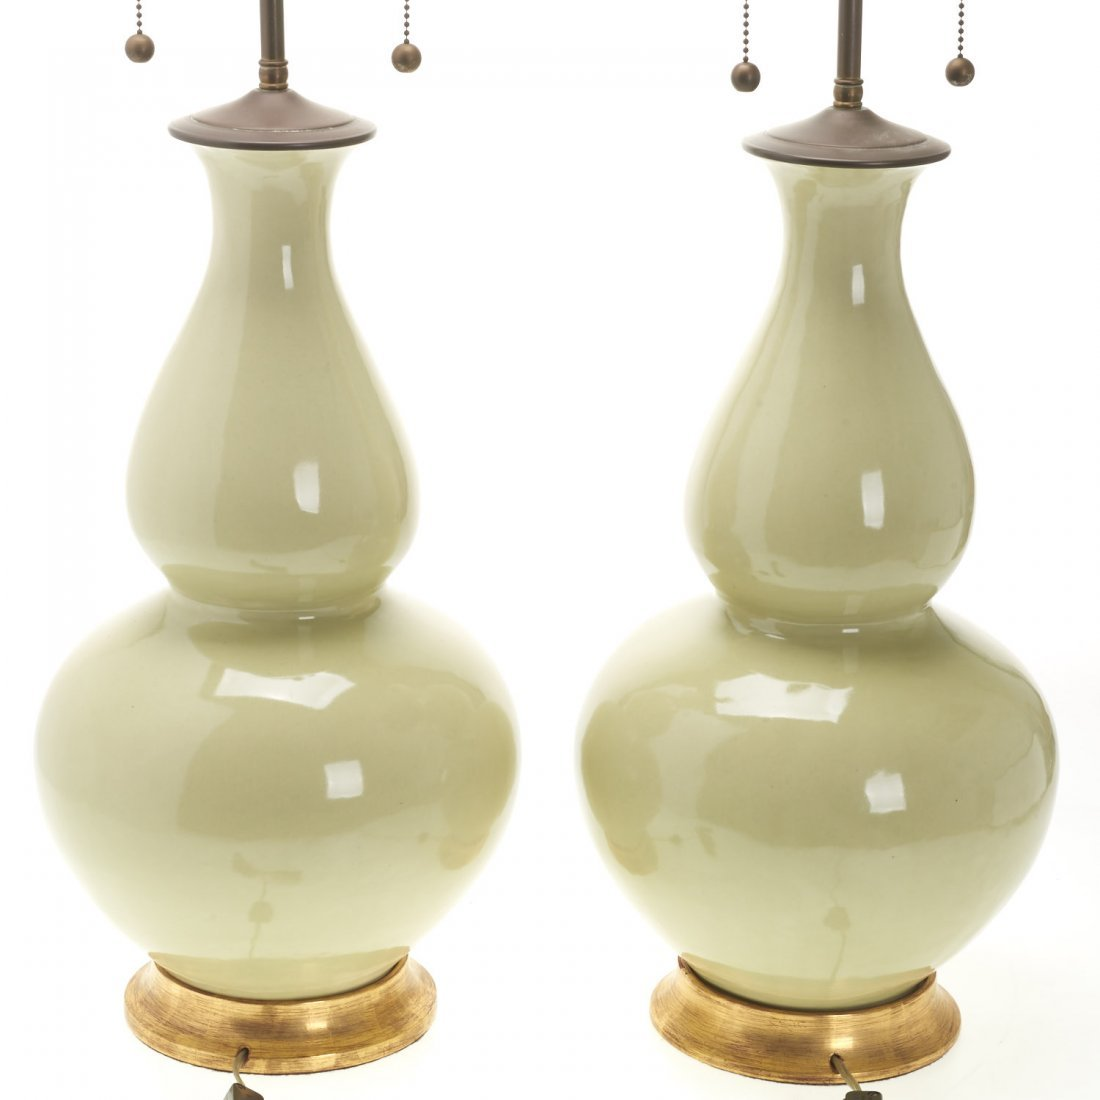 Pair Christopher Spitzmiller green ceramic lamps - 4